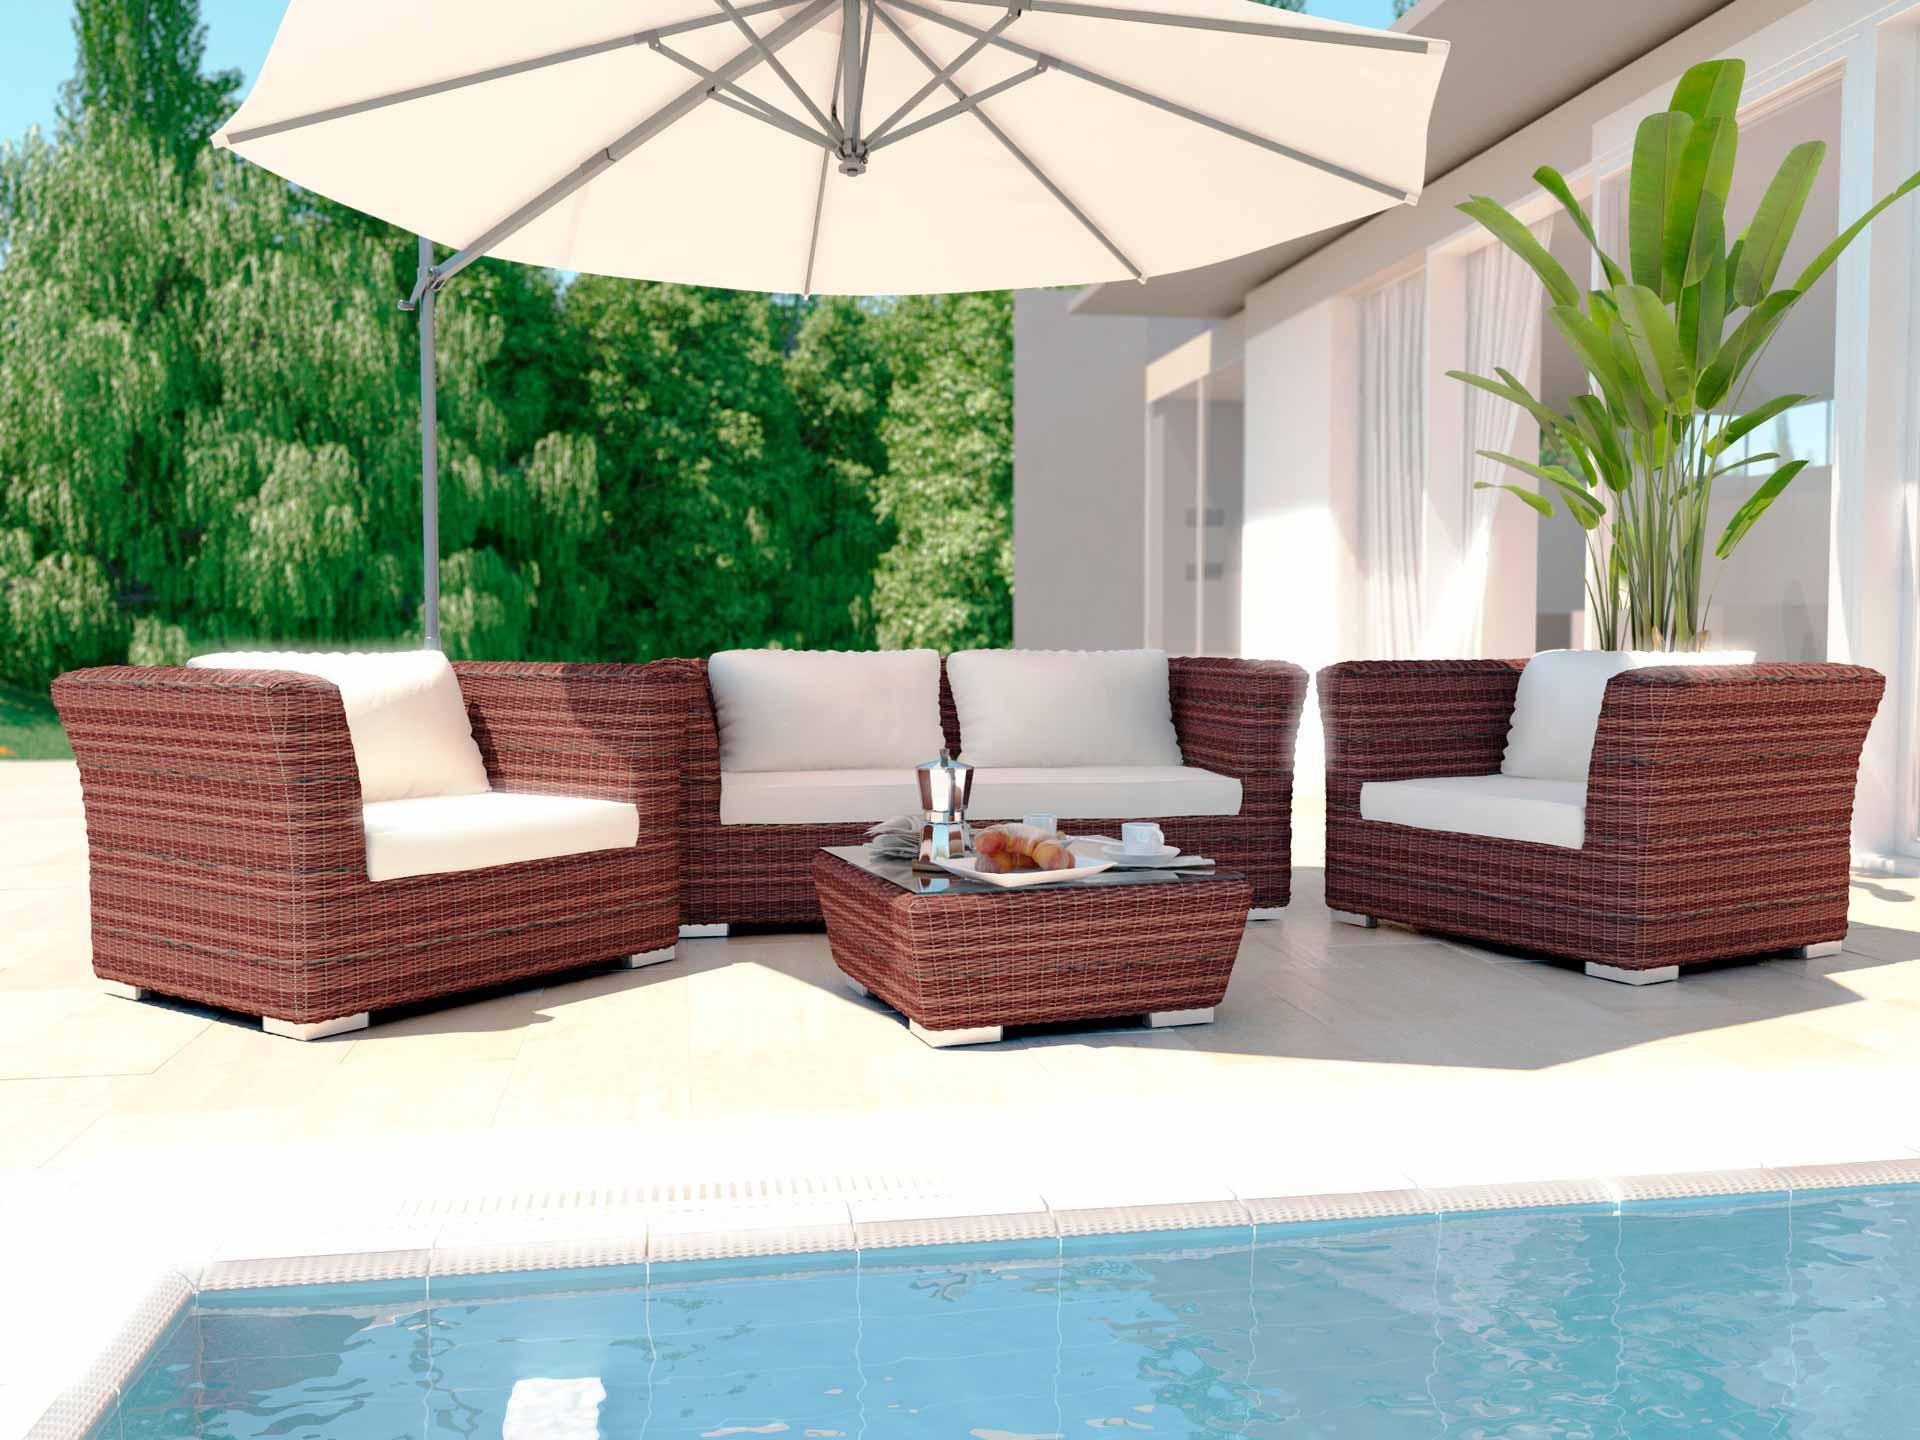 Artelia salotto da giardino for Balkonmobel rattan lounge